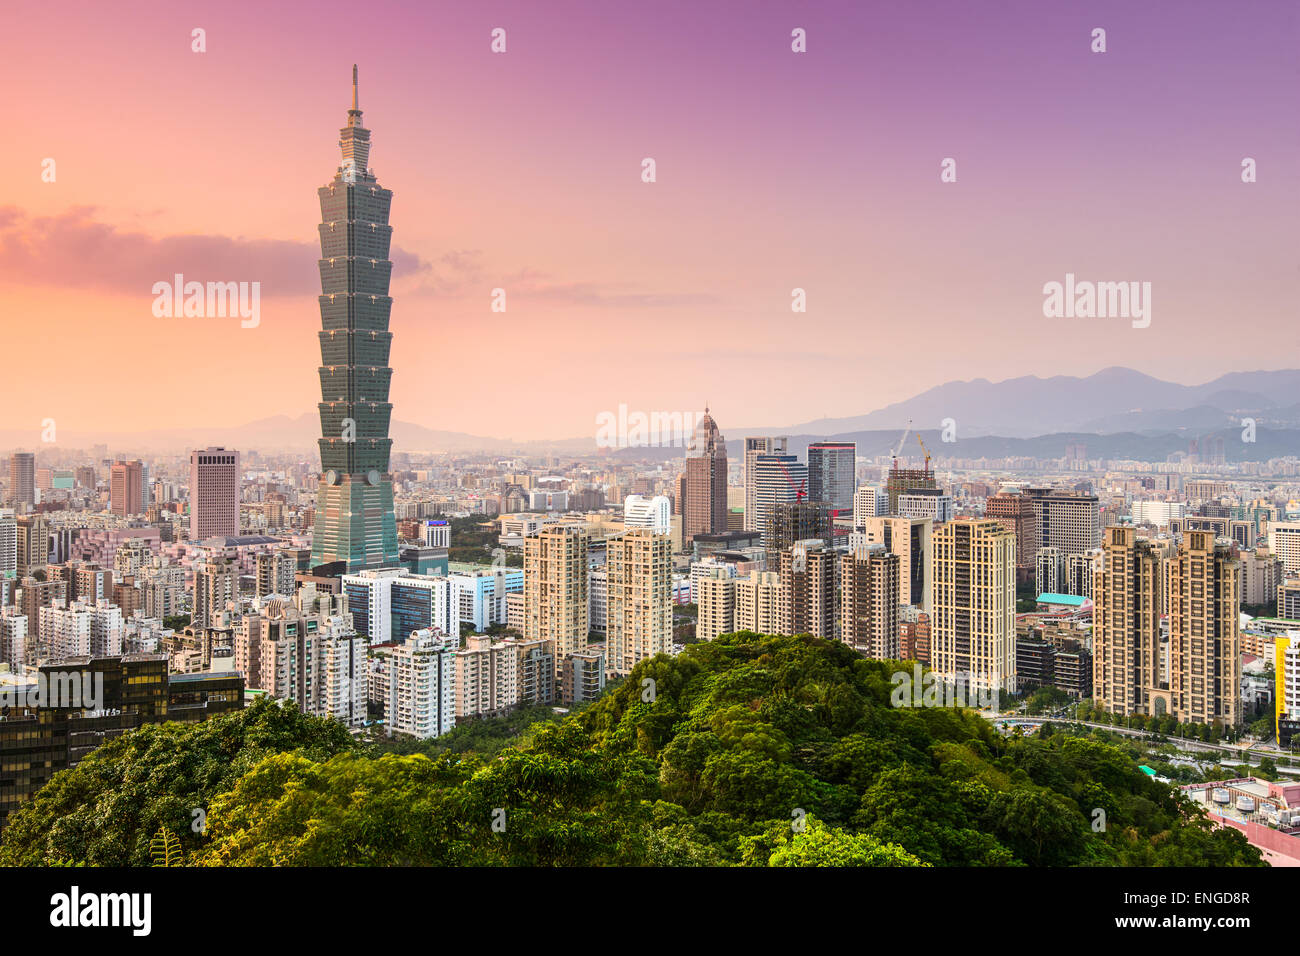 Taipei, Taiwán skyline del distrito de Xinyi. Imagen De Stock